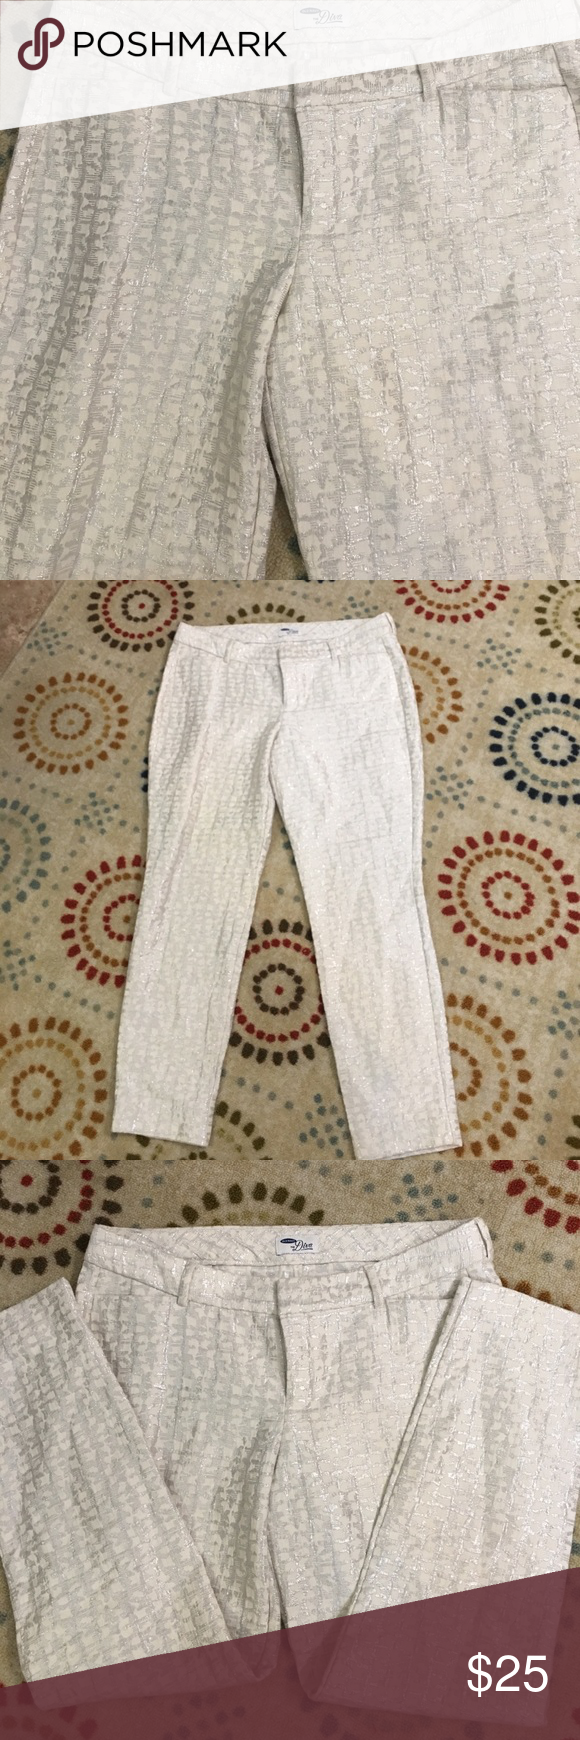 "Old Navy The Diva Silver White Capri 8 NWOT. Never worn size 8 slacks.    Waist = 17""  Hips = 19"". Inseam 26"".   Really fun classy slacks. Old Navy Pants Capris"